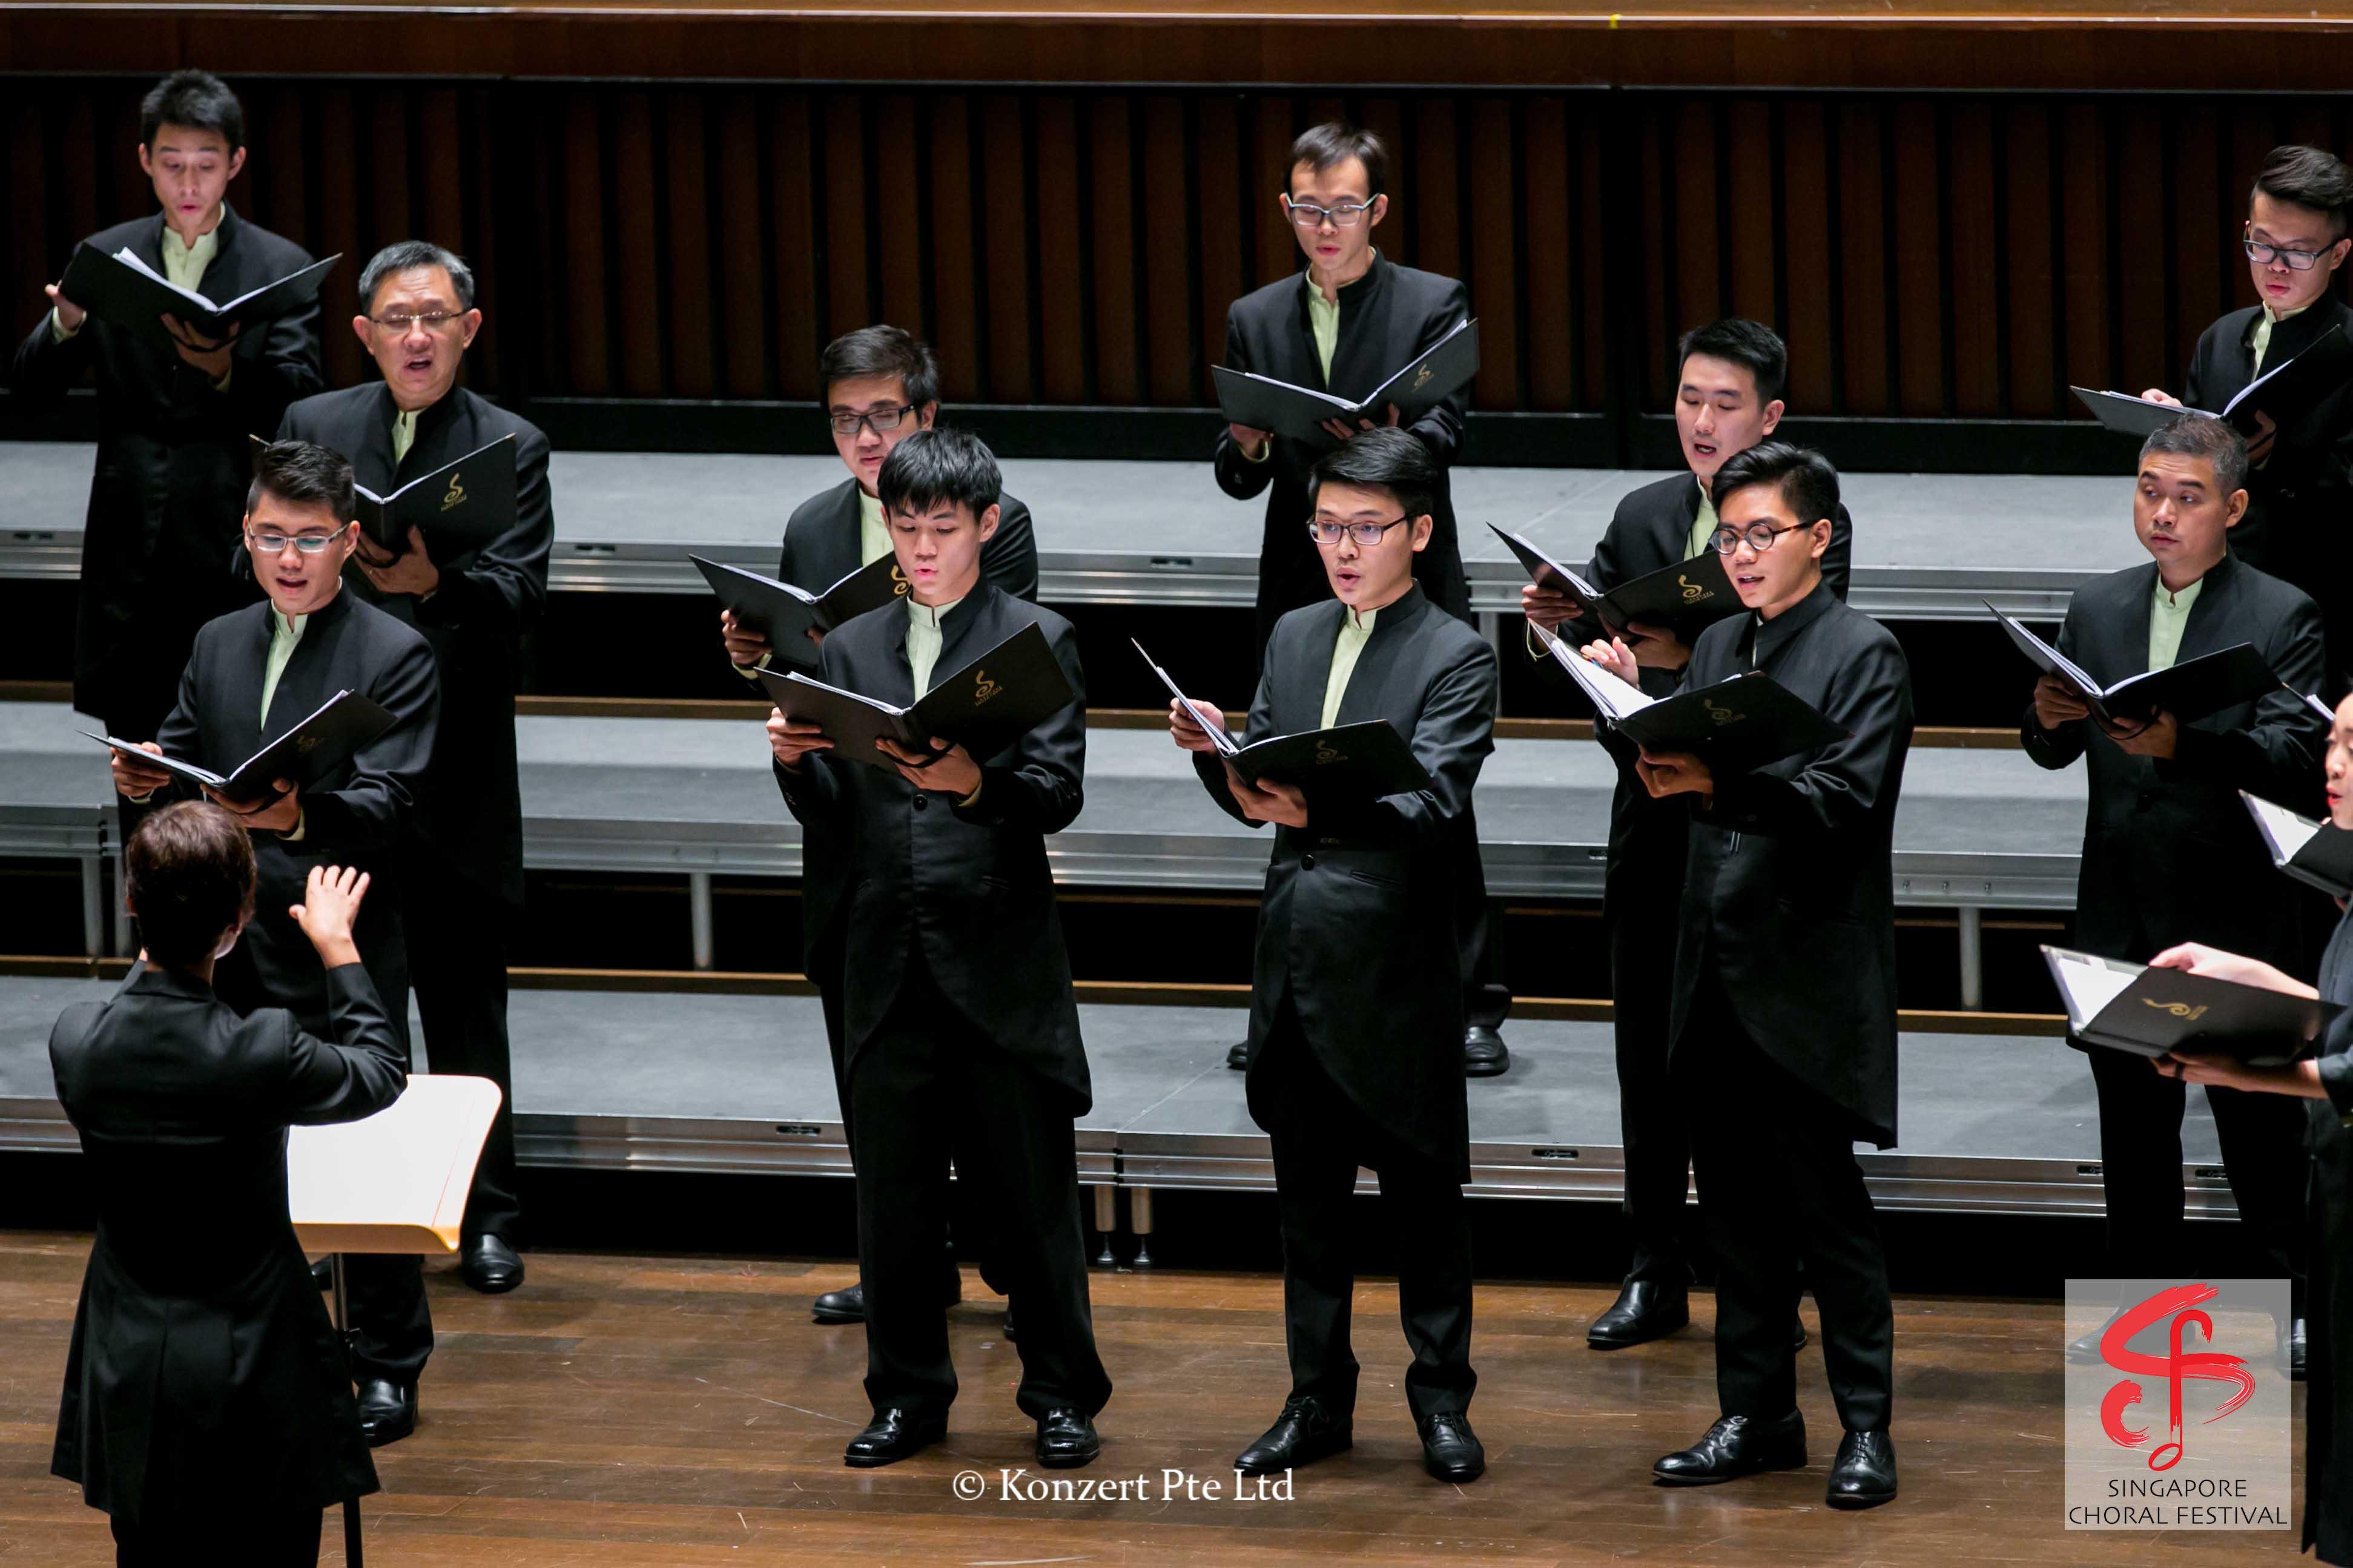 Singapore Choral Festival 8-8-15 (225).jpg